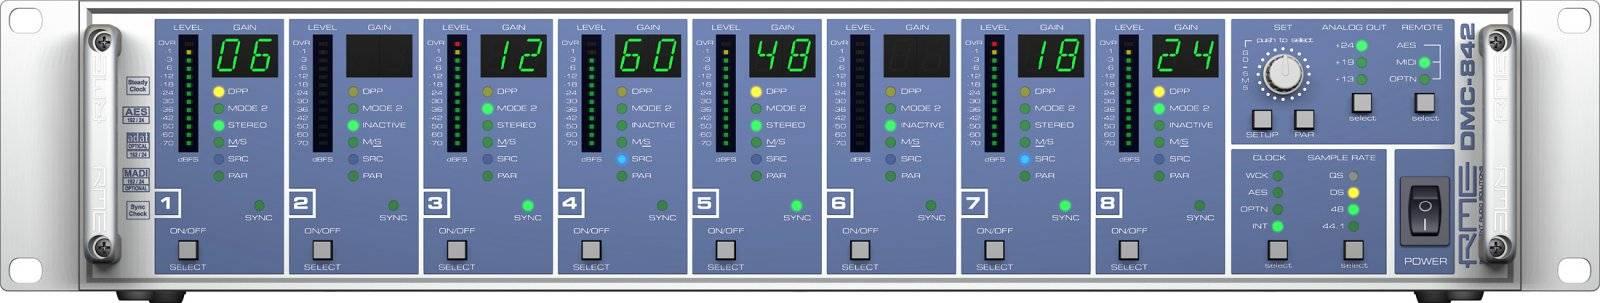 RME DMC842 8-Channel Digital Mic Preamp dmc-842 Product Image 2